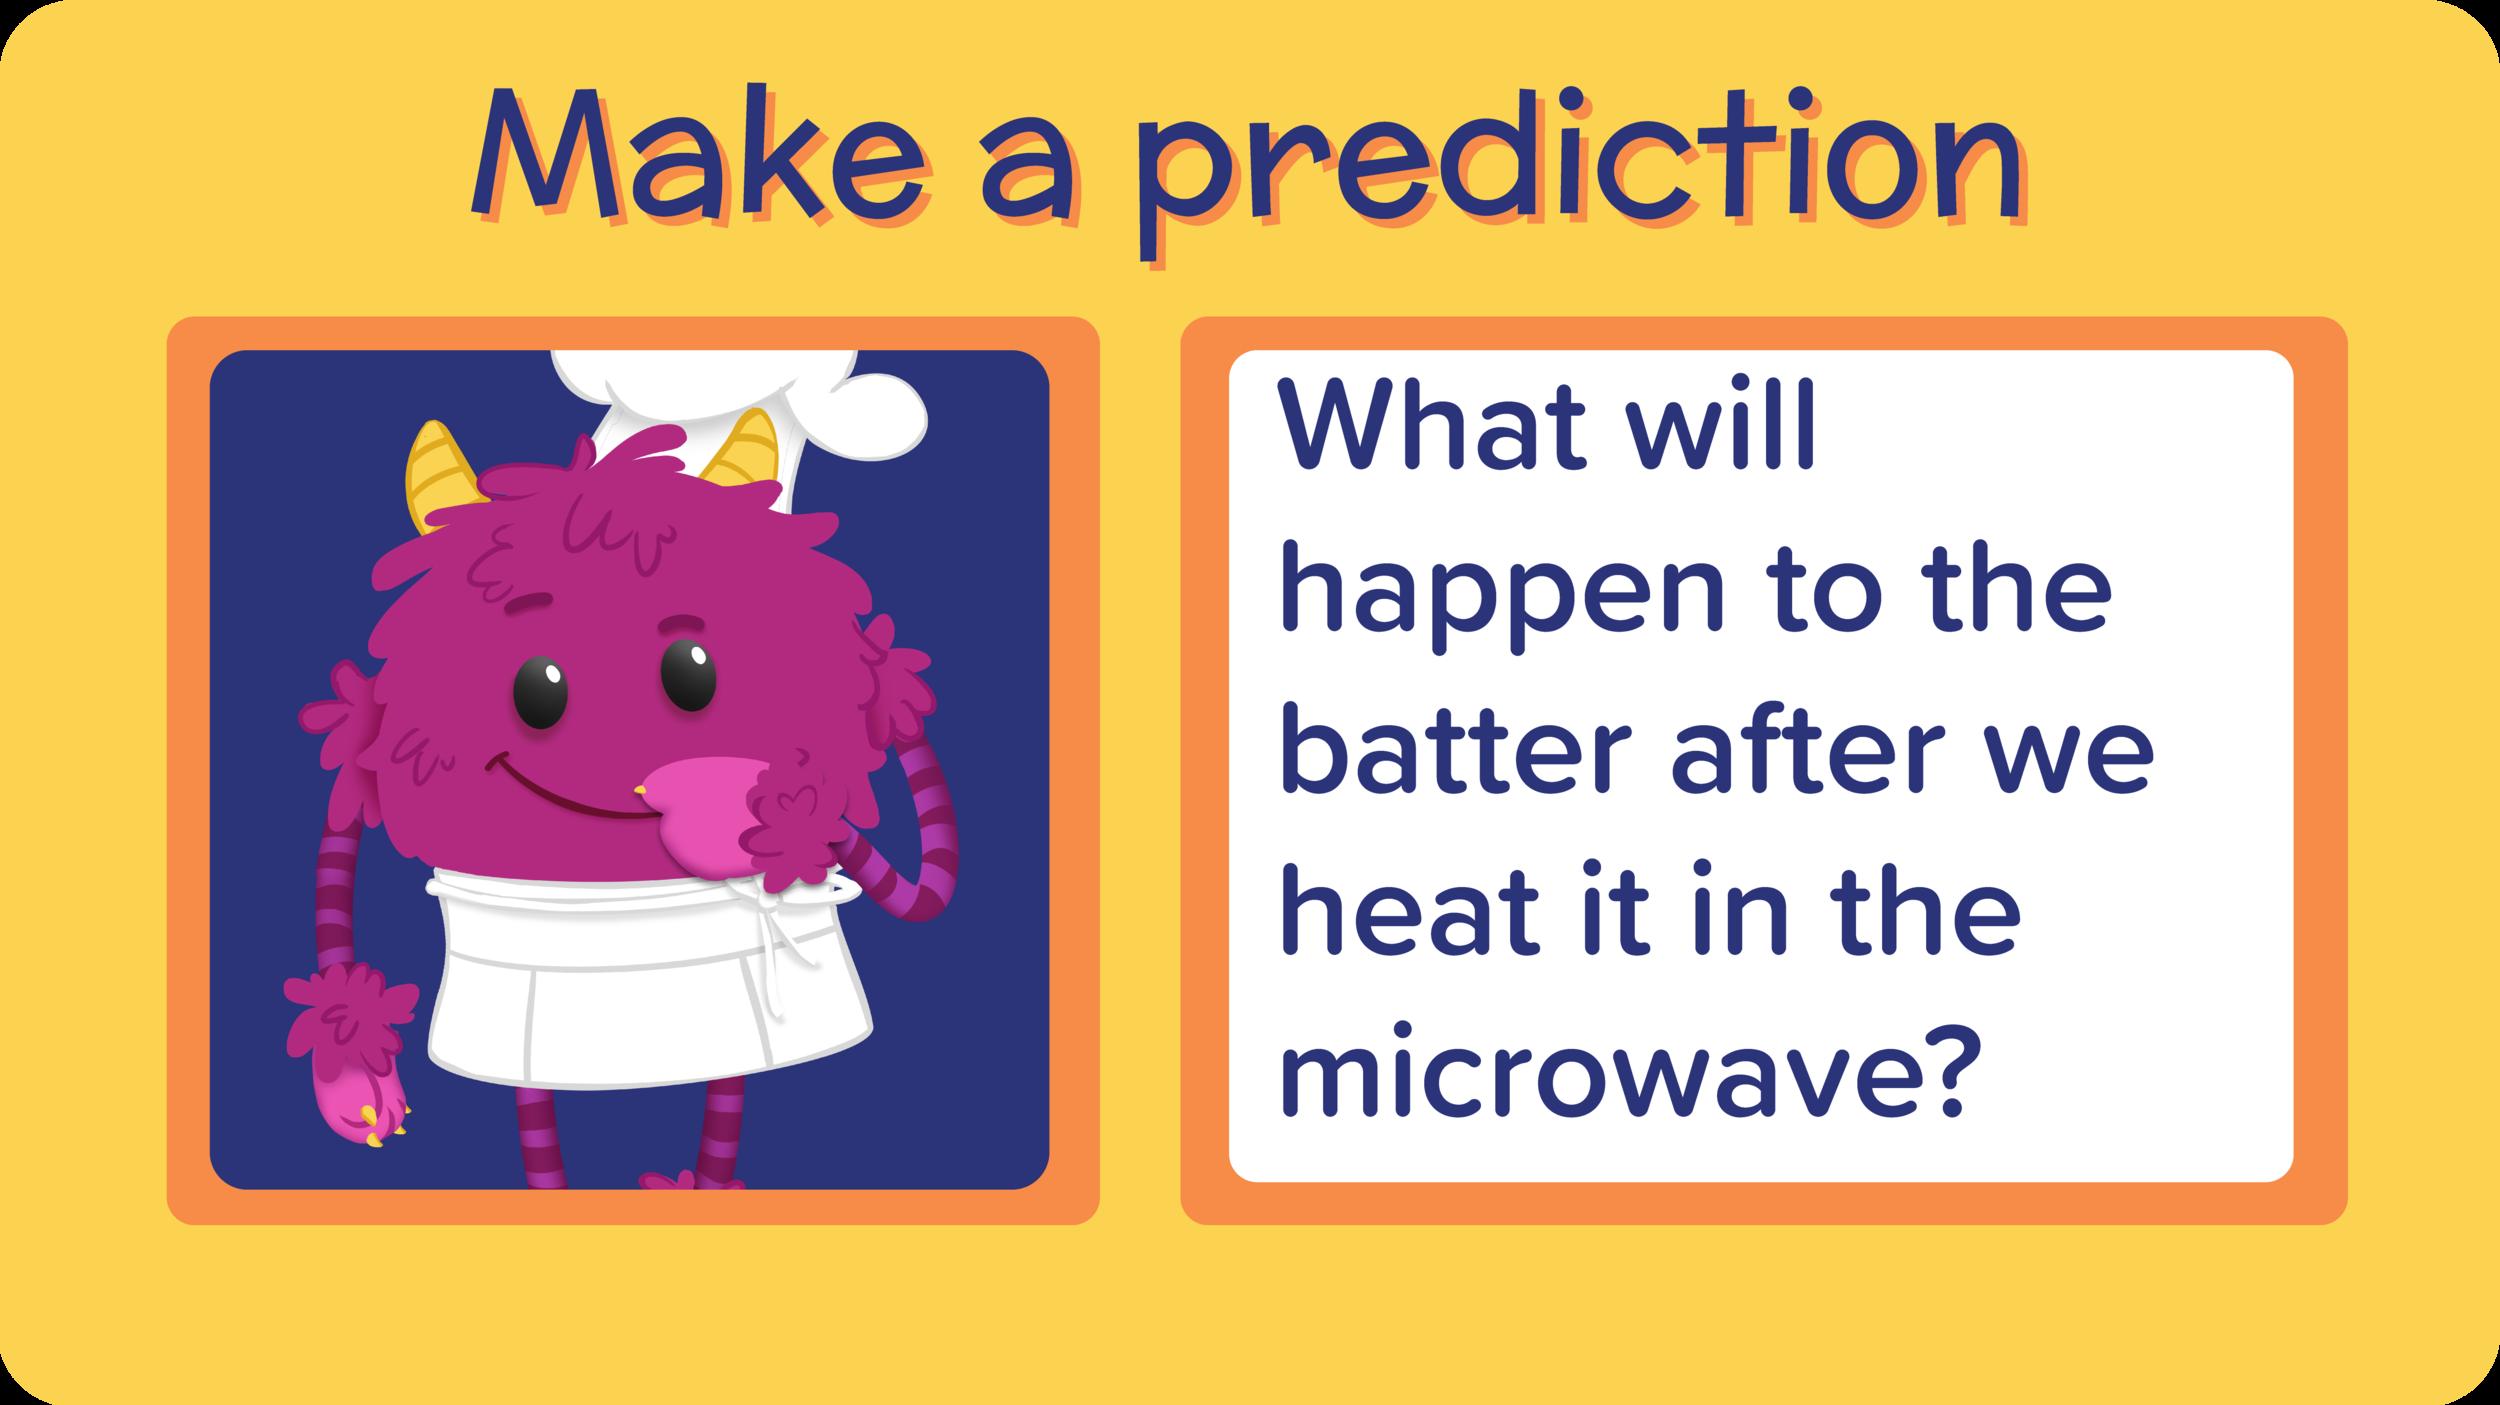 20_BlueberryMugMuffin_make a prediction-01.png